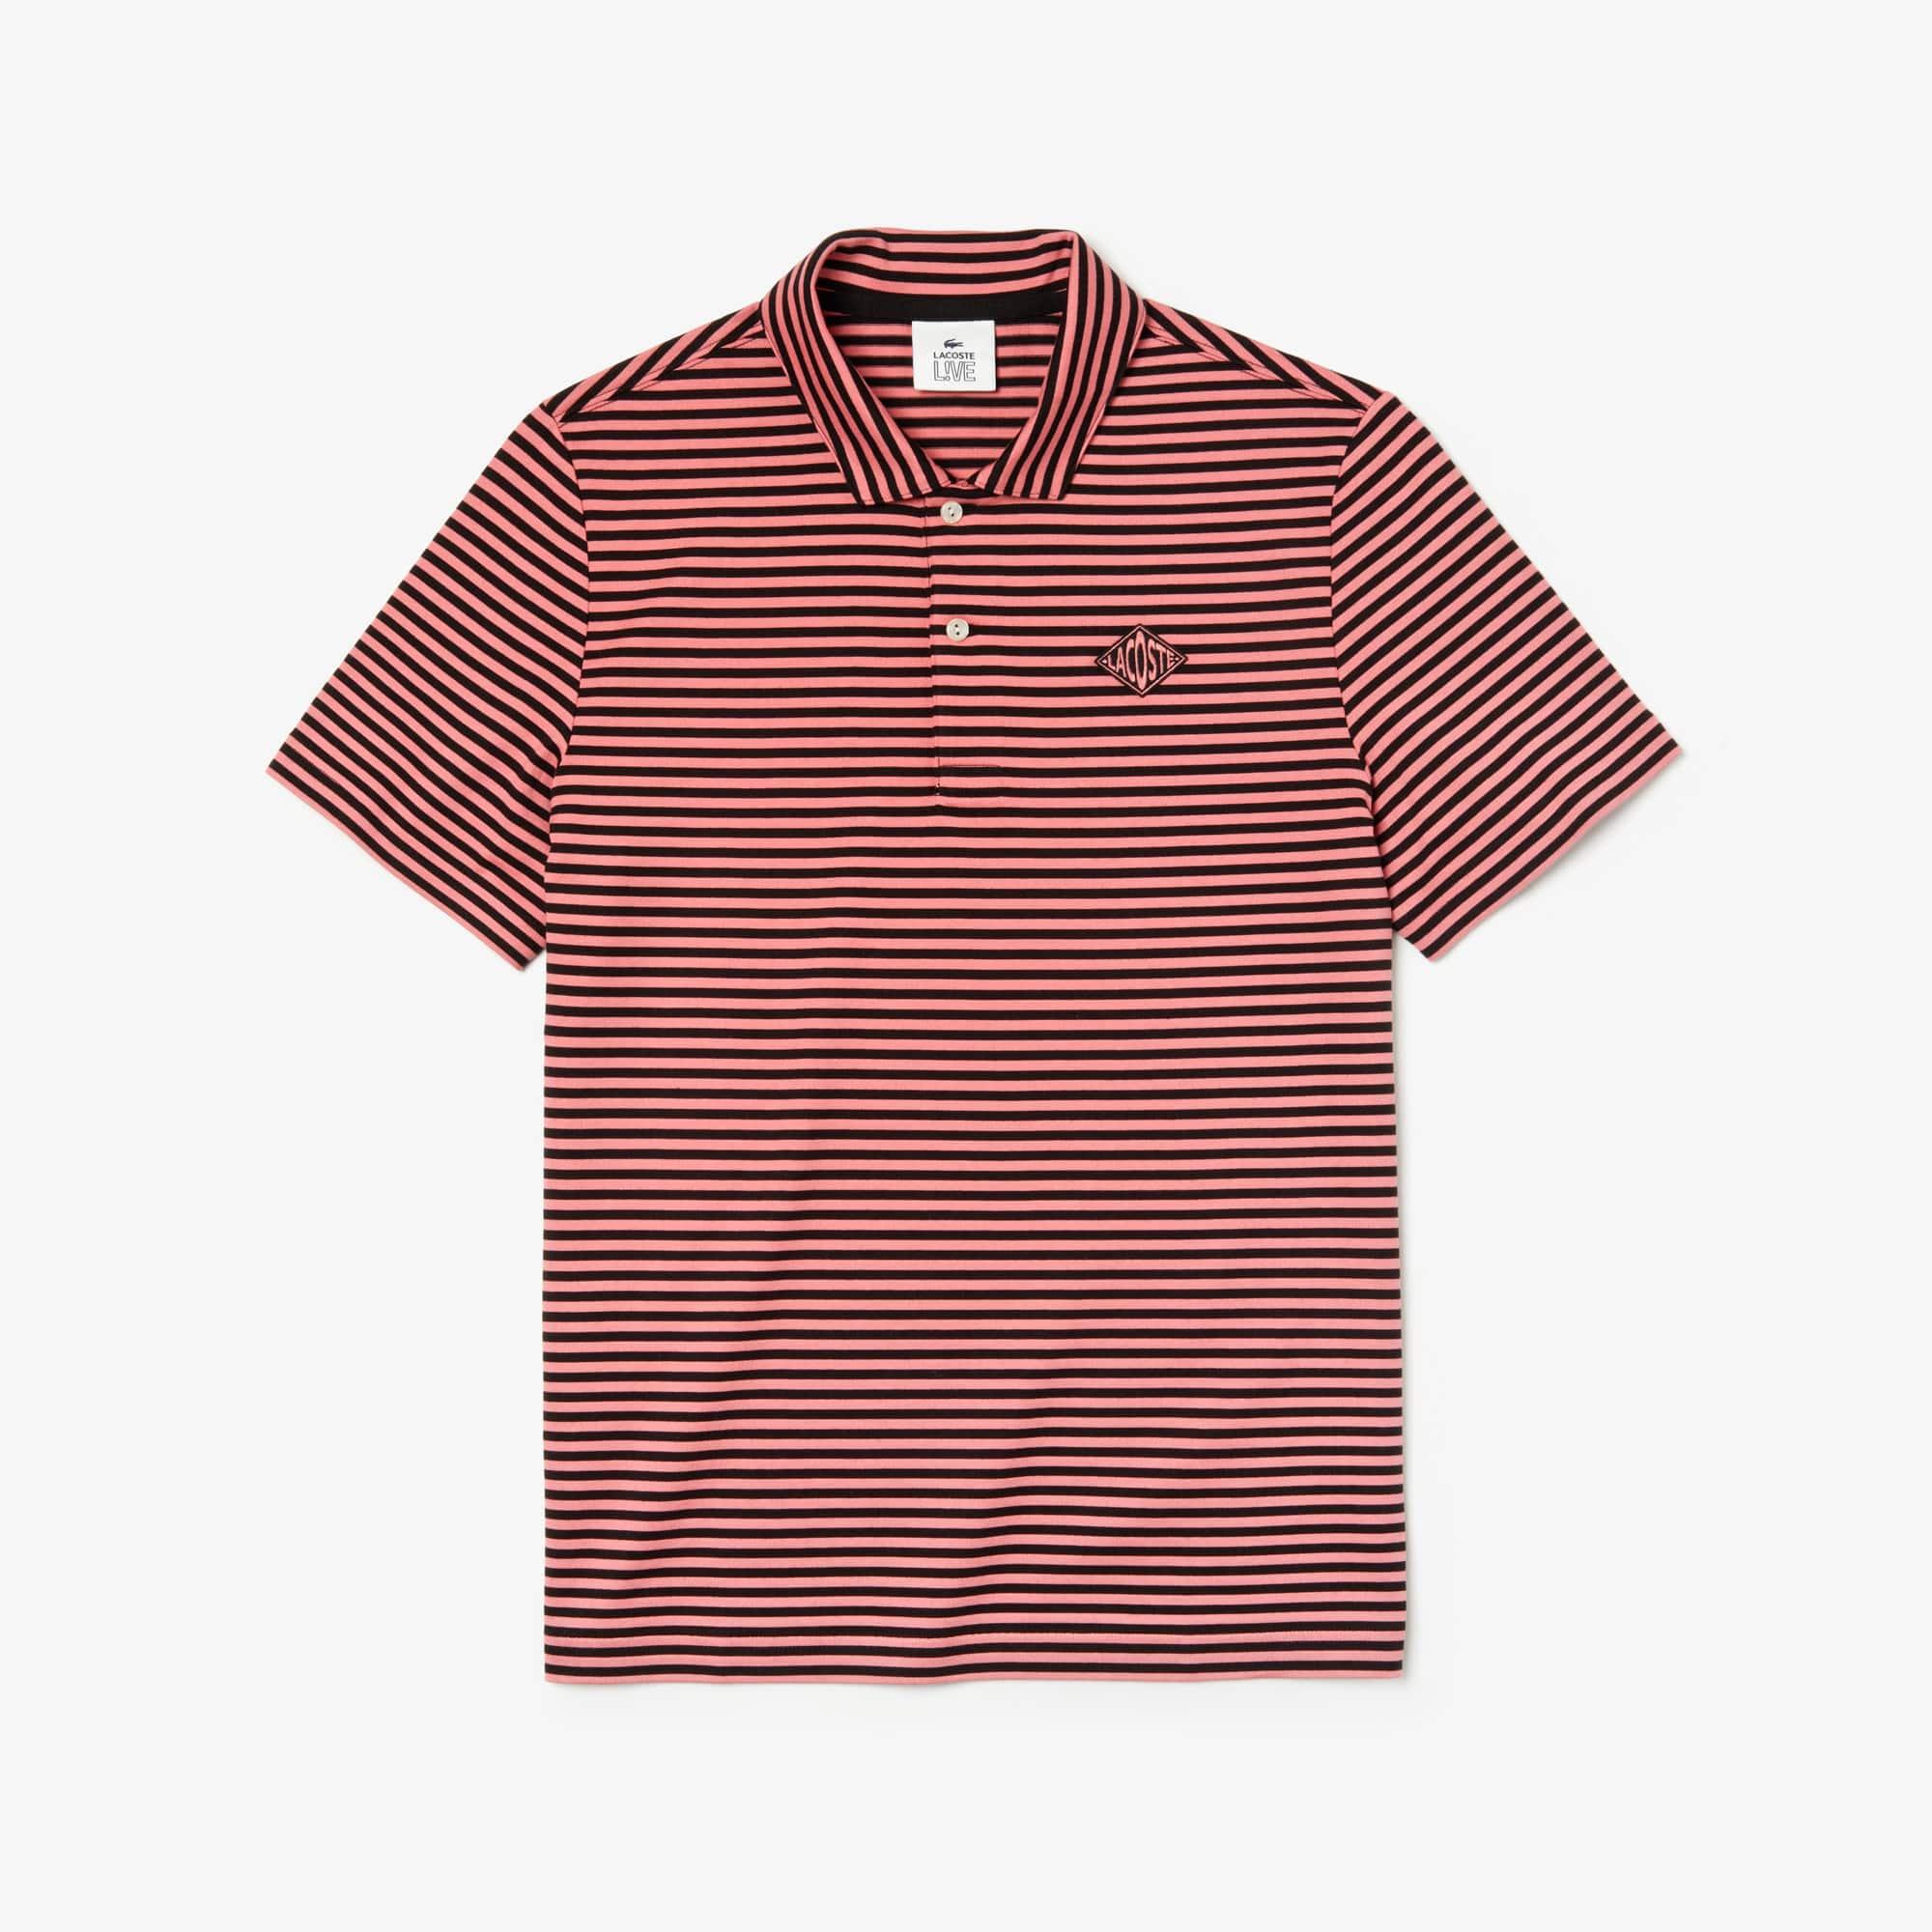 375e38770e Men's LIVE Regular Fit Cotton Polo